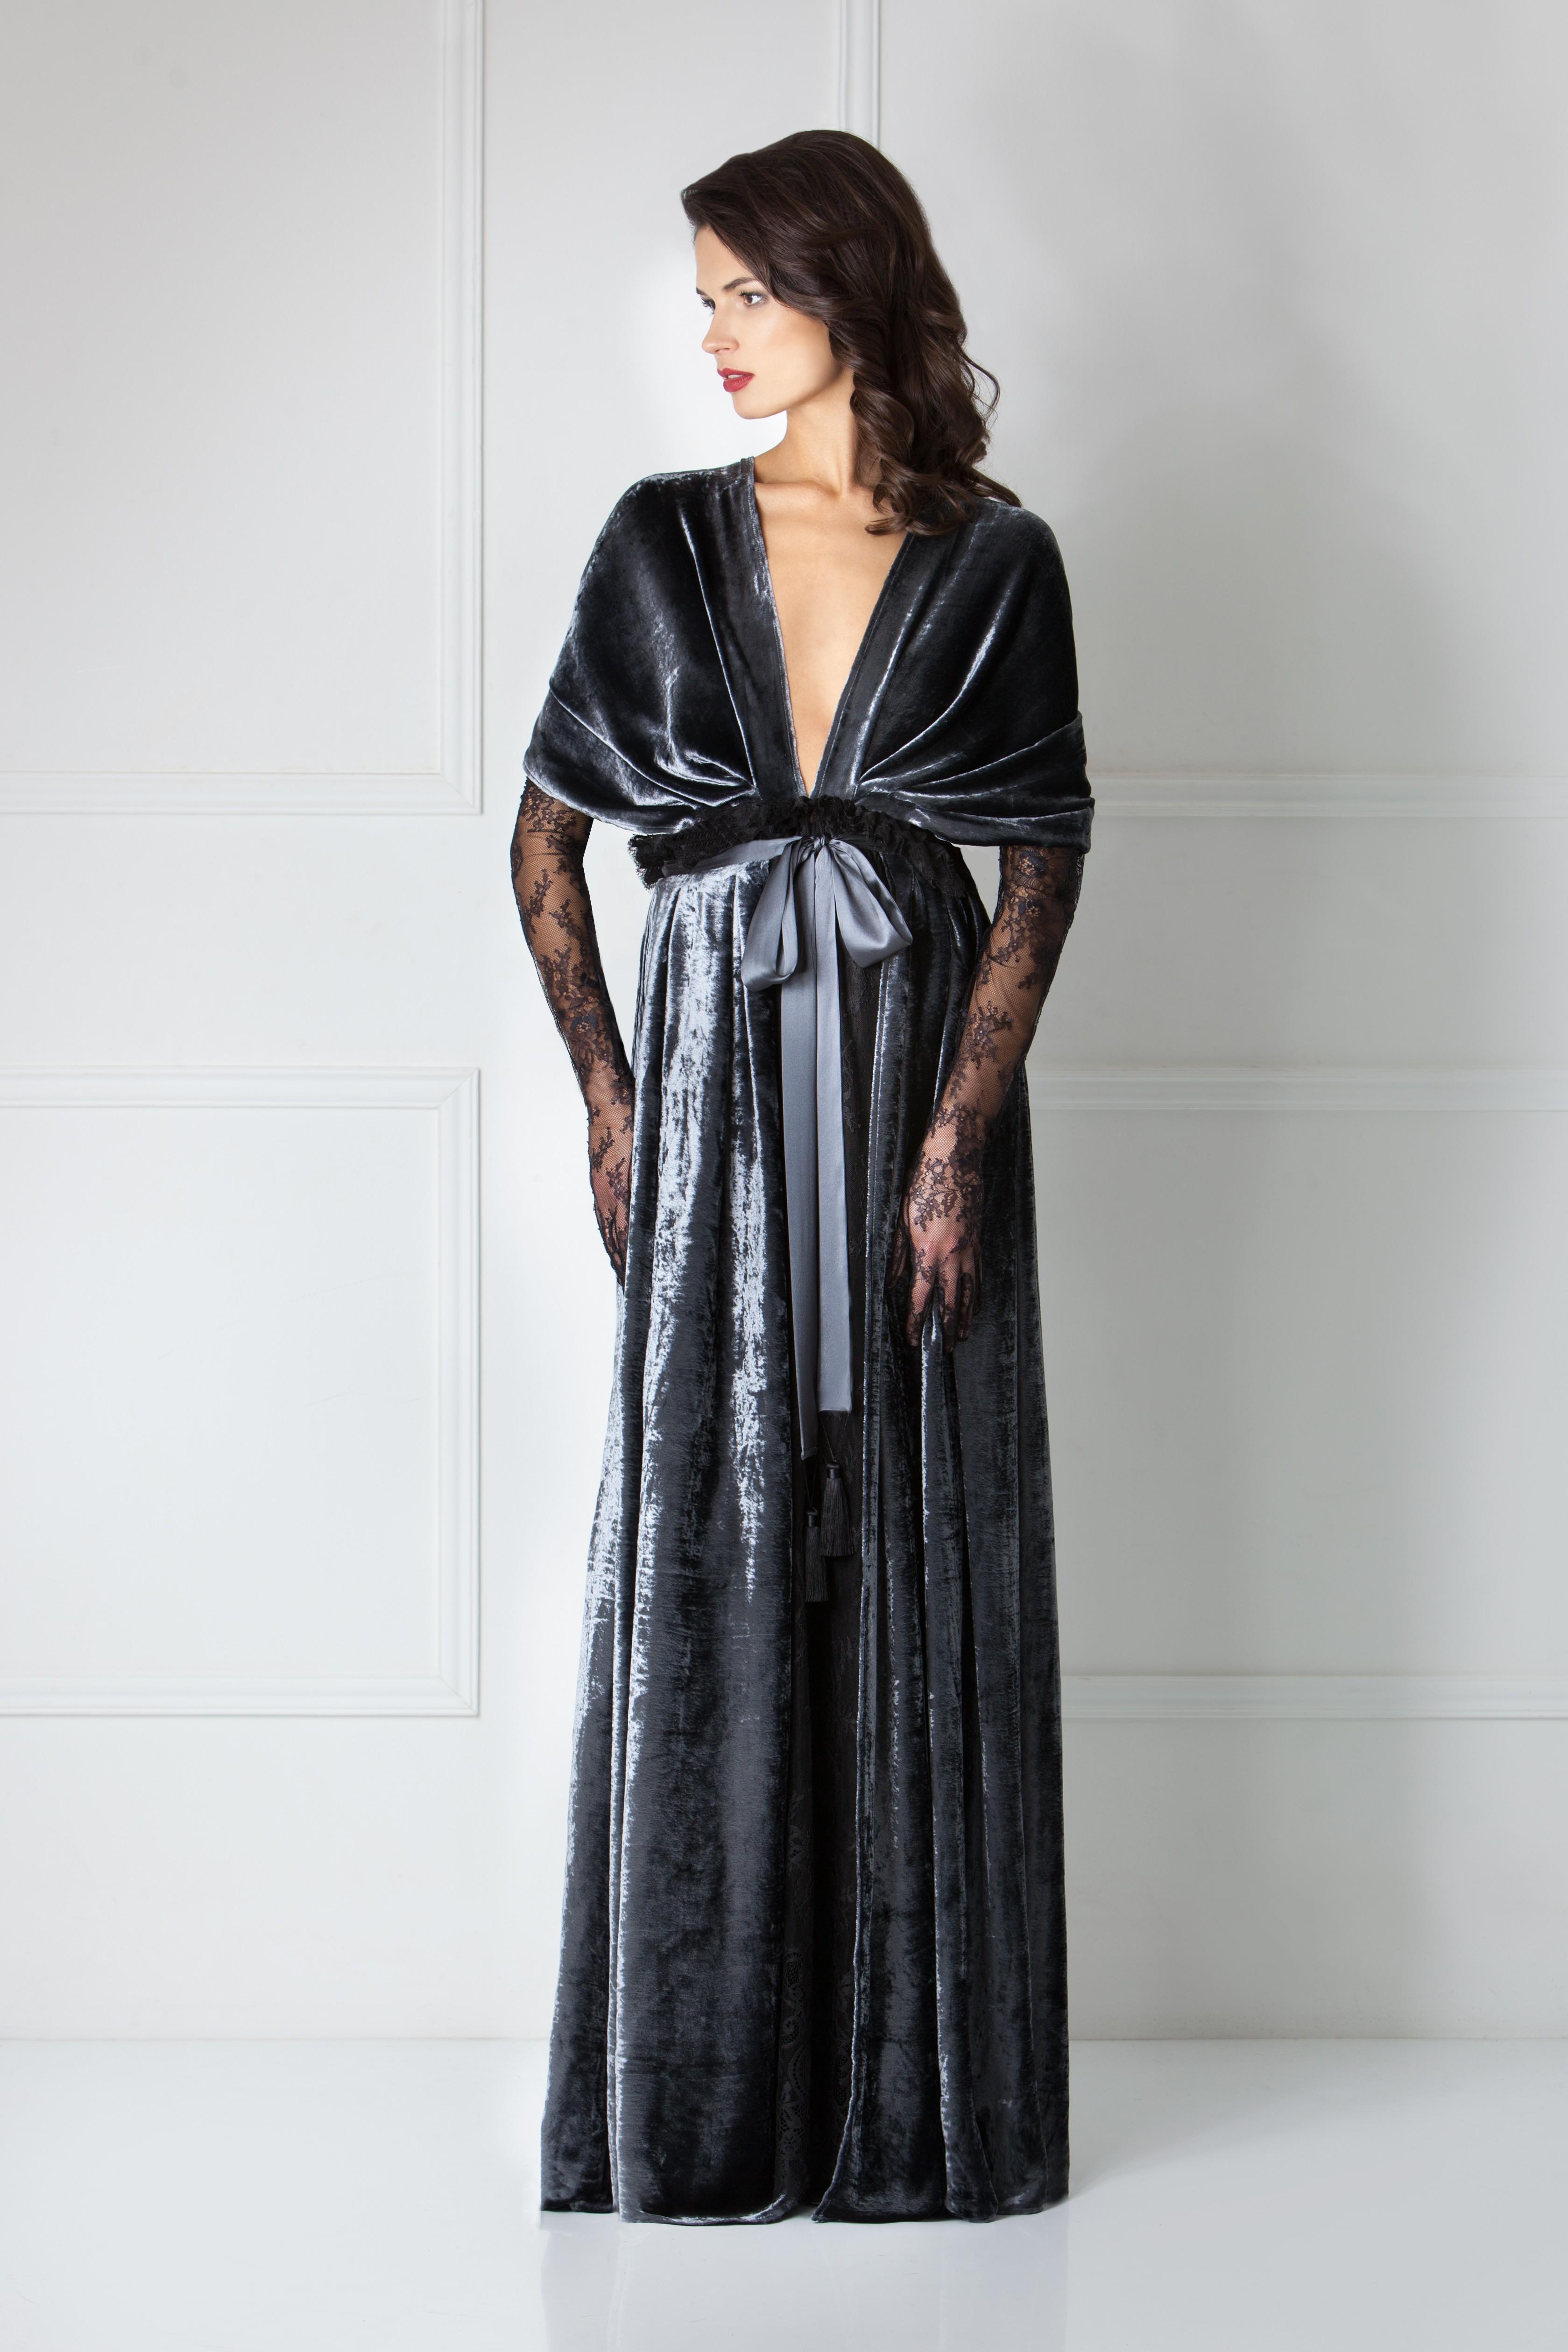 Будуарное платье из бархата из серии Wild Roses от Amoralle, €1,550